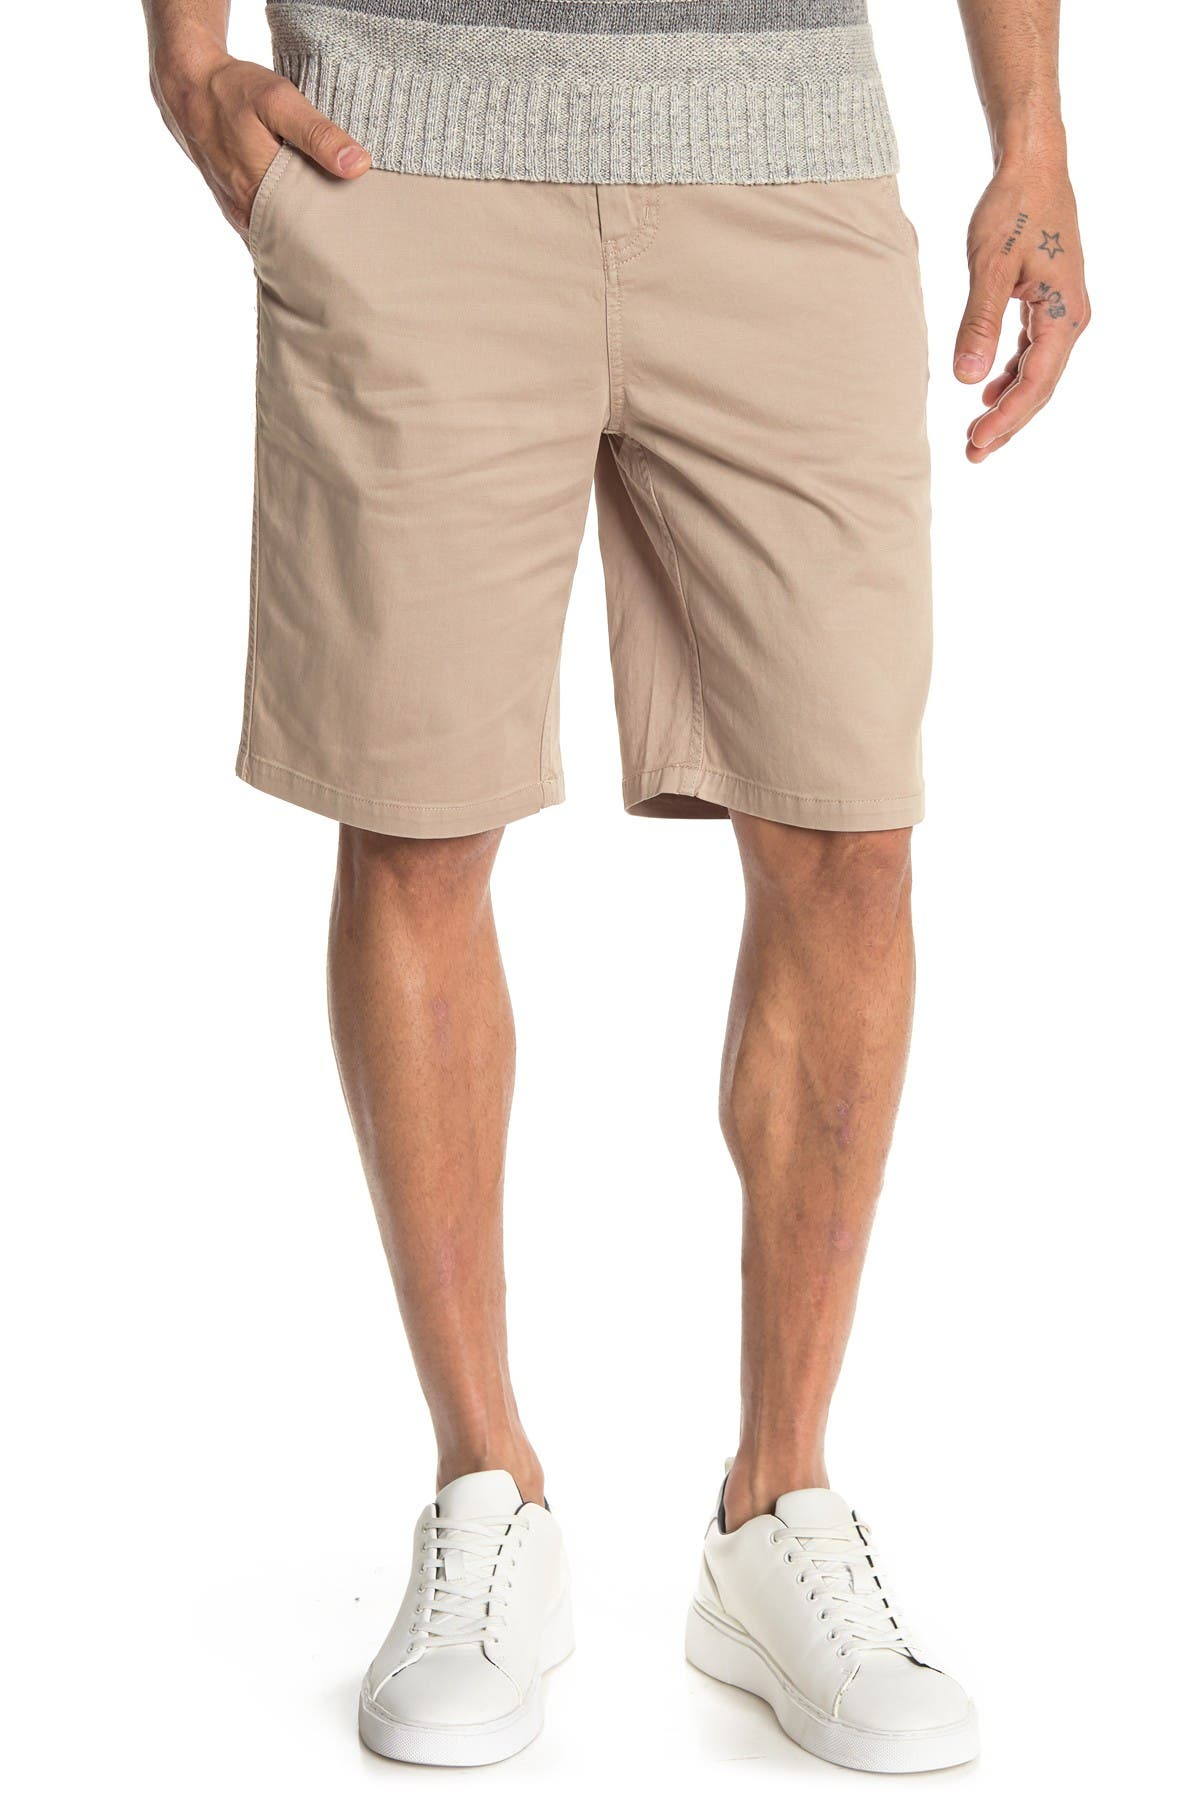 Image of BLDWN Wyatt Shorts